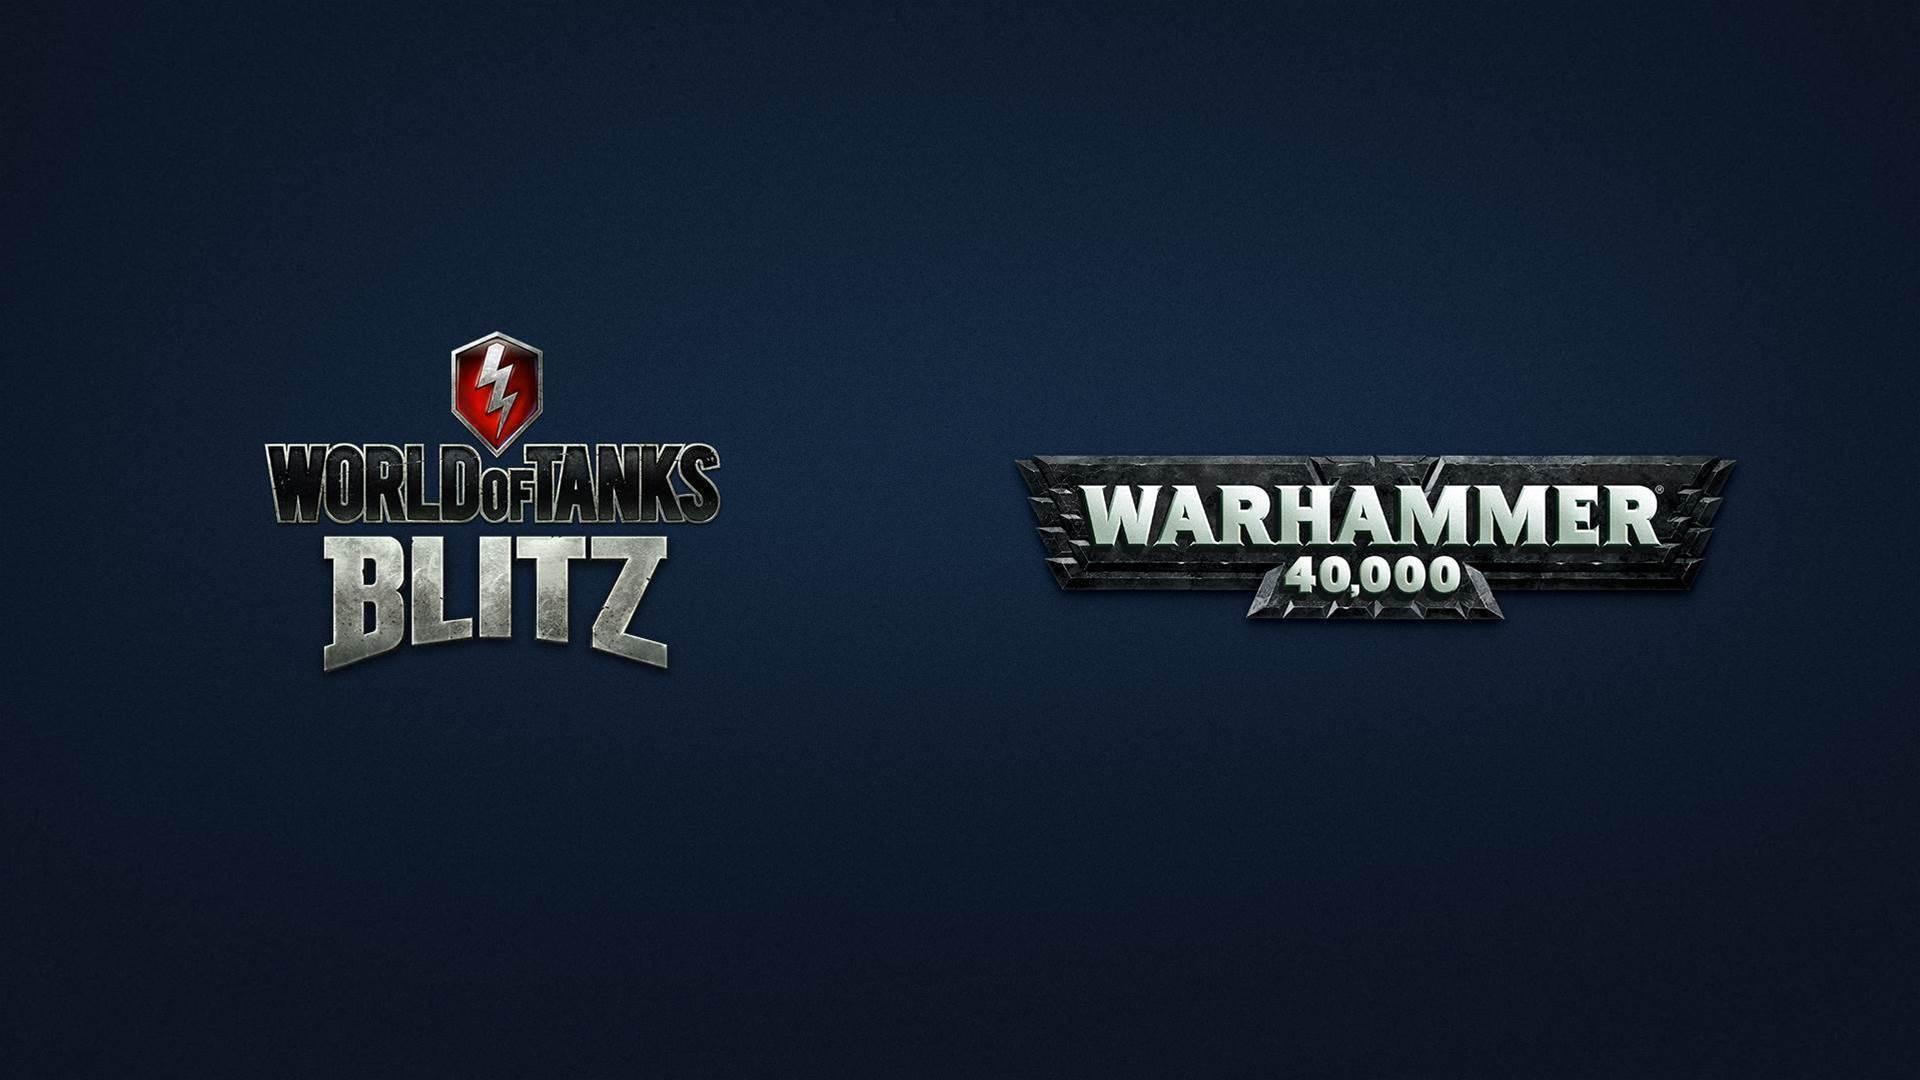 The tanks of Warhammer 40,000 invade World of Tanks Blitz